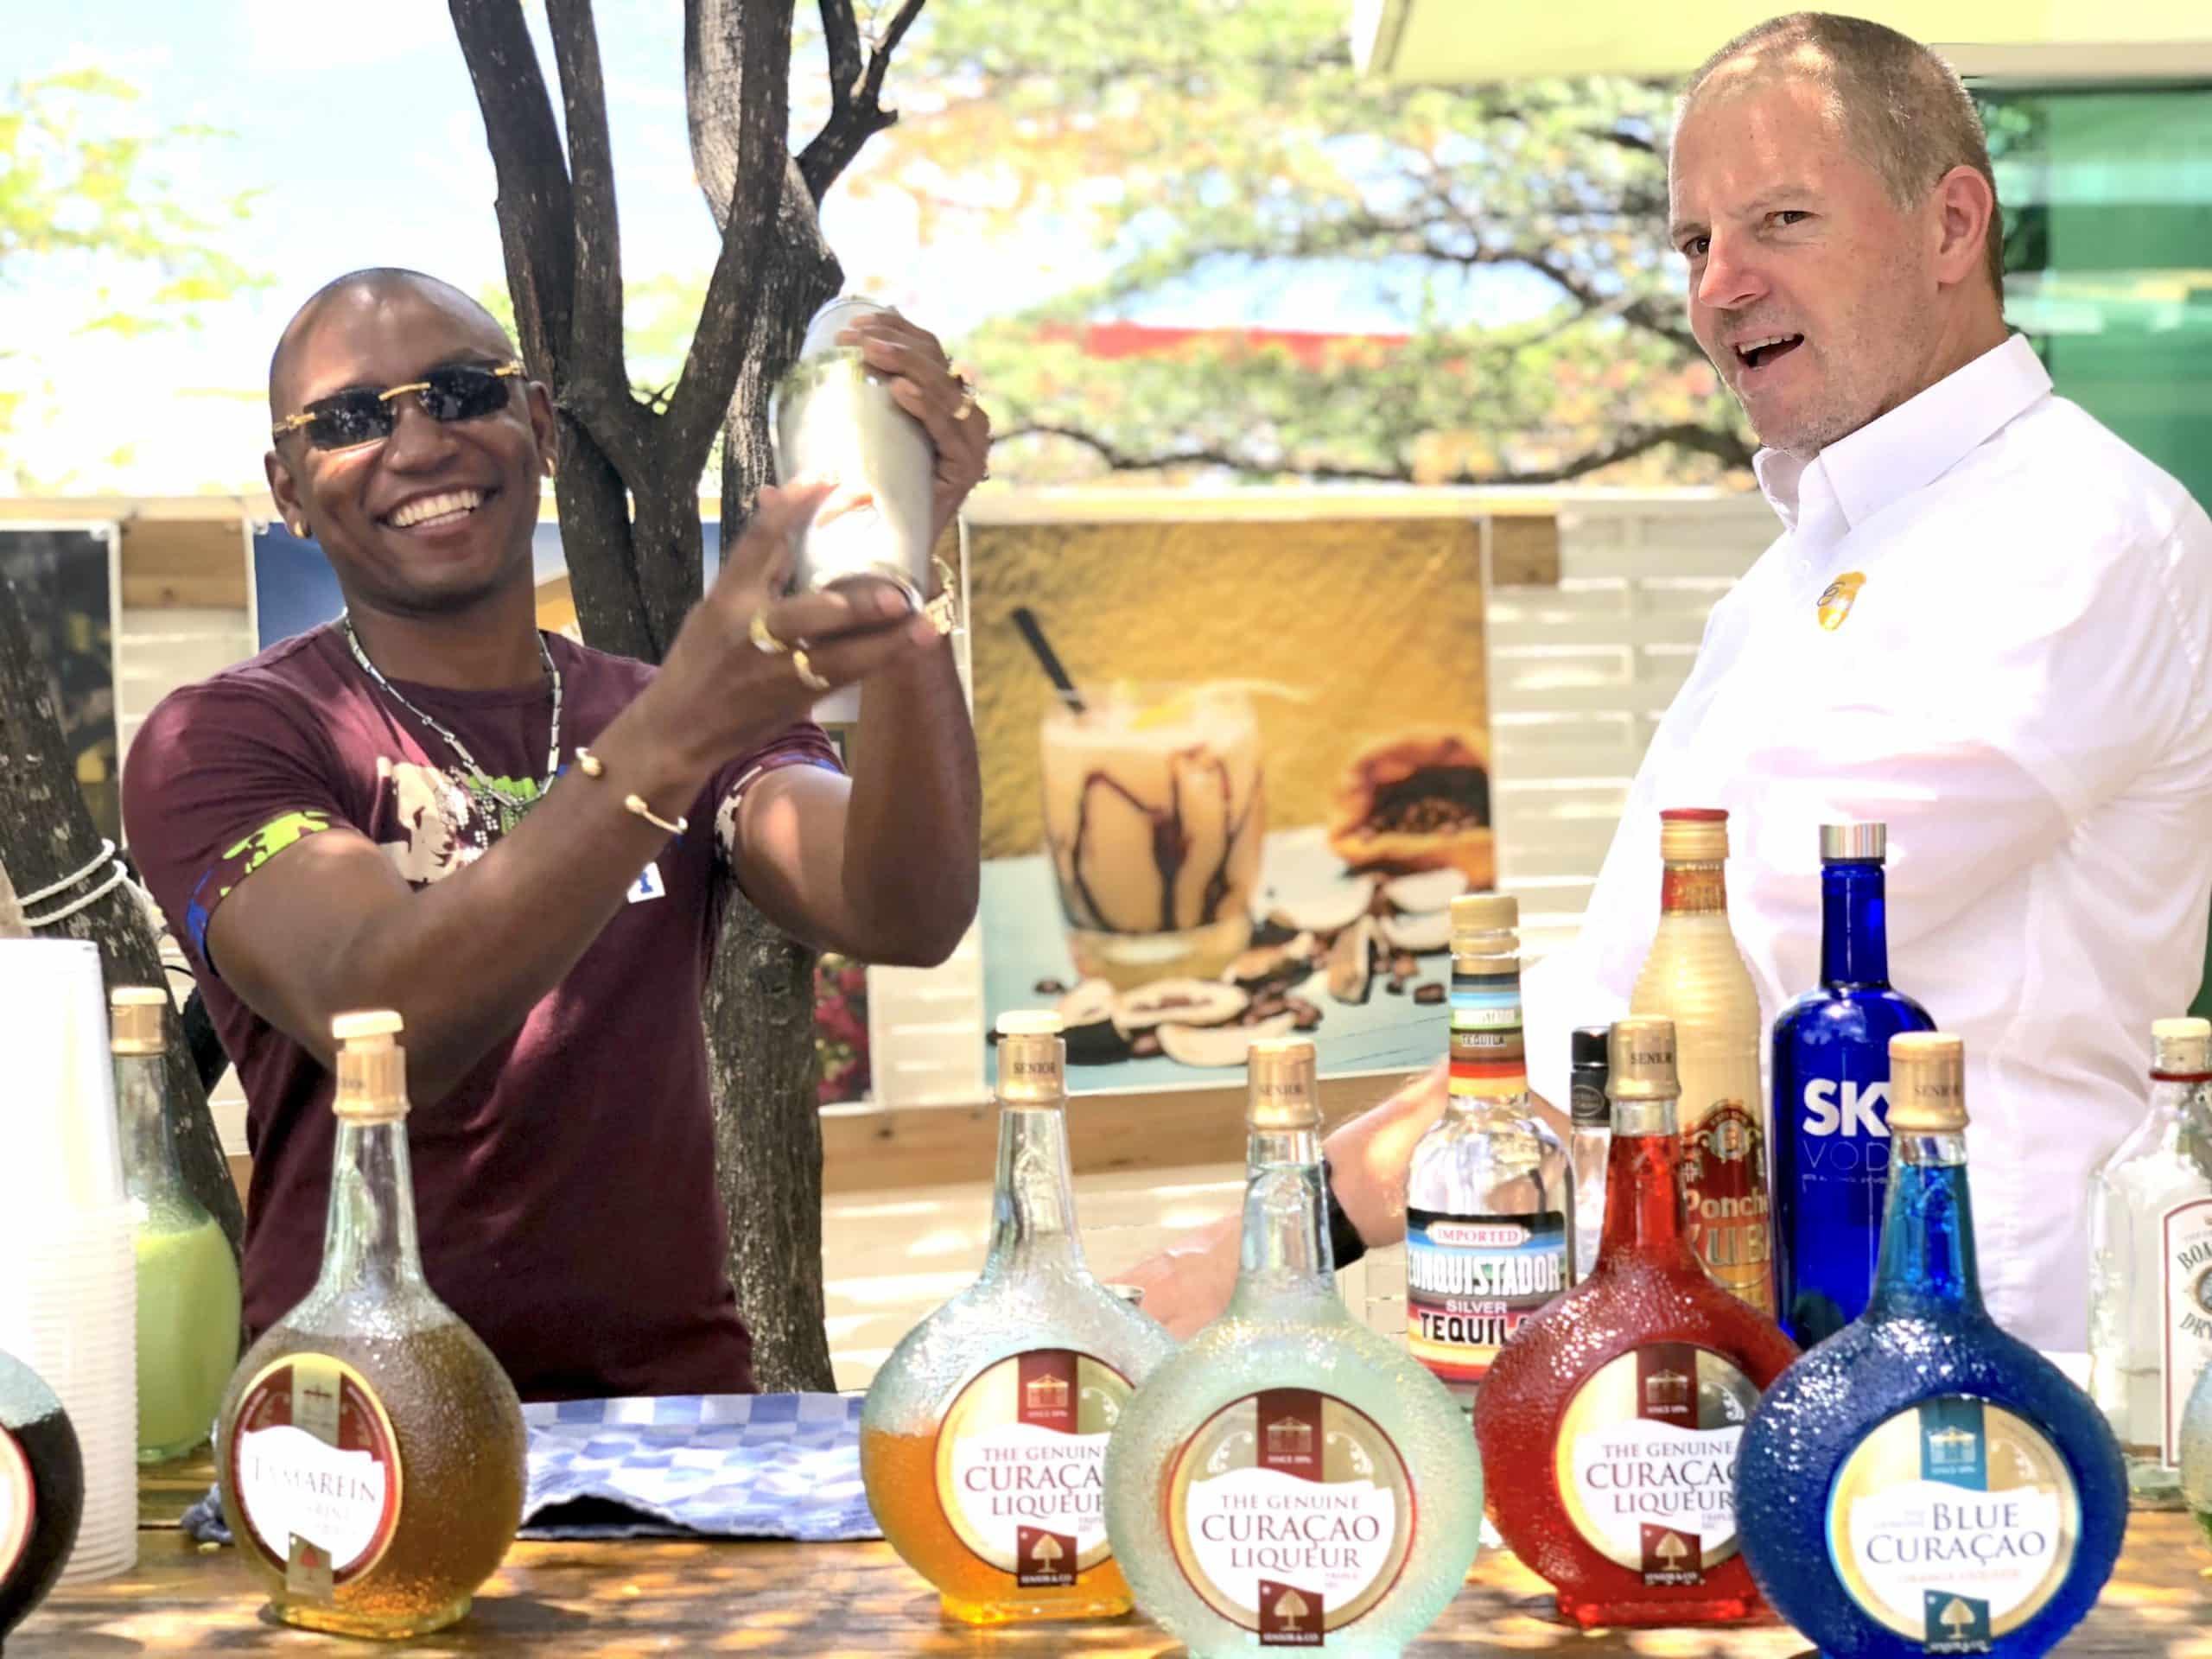 Curaçao-cocktail-lesson-Landhuis-Chobolobo-blue-Curaçao-distillery